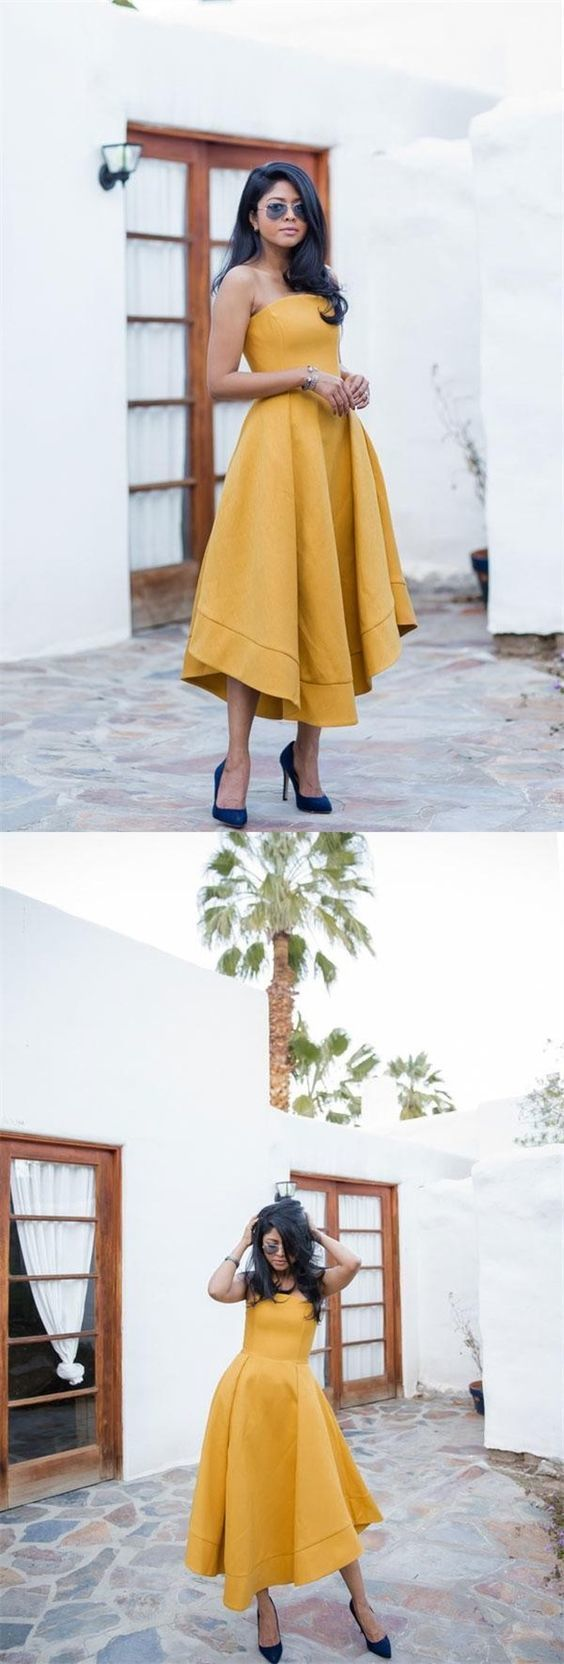 Aline strapless asymmetrical yellow homecomingprom dress